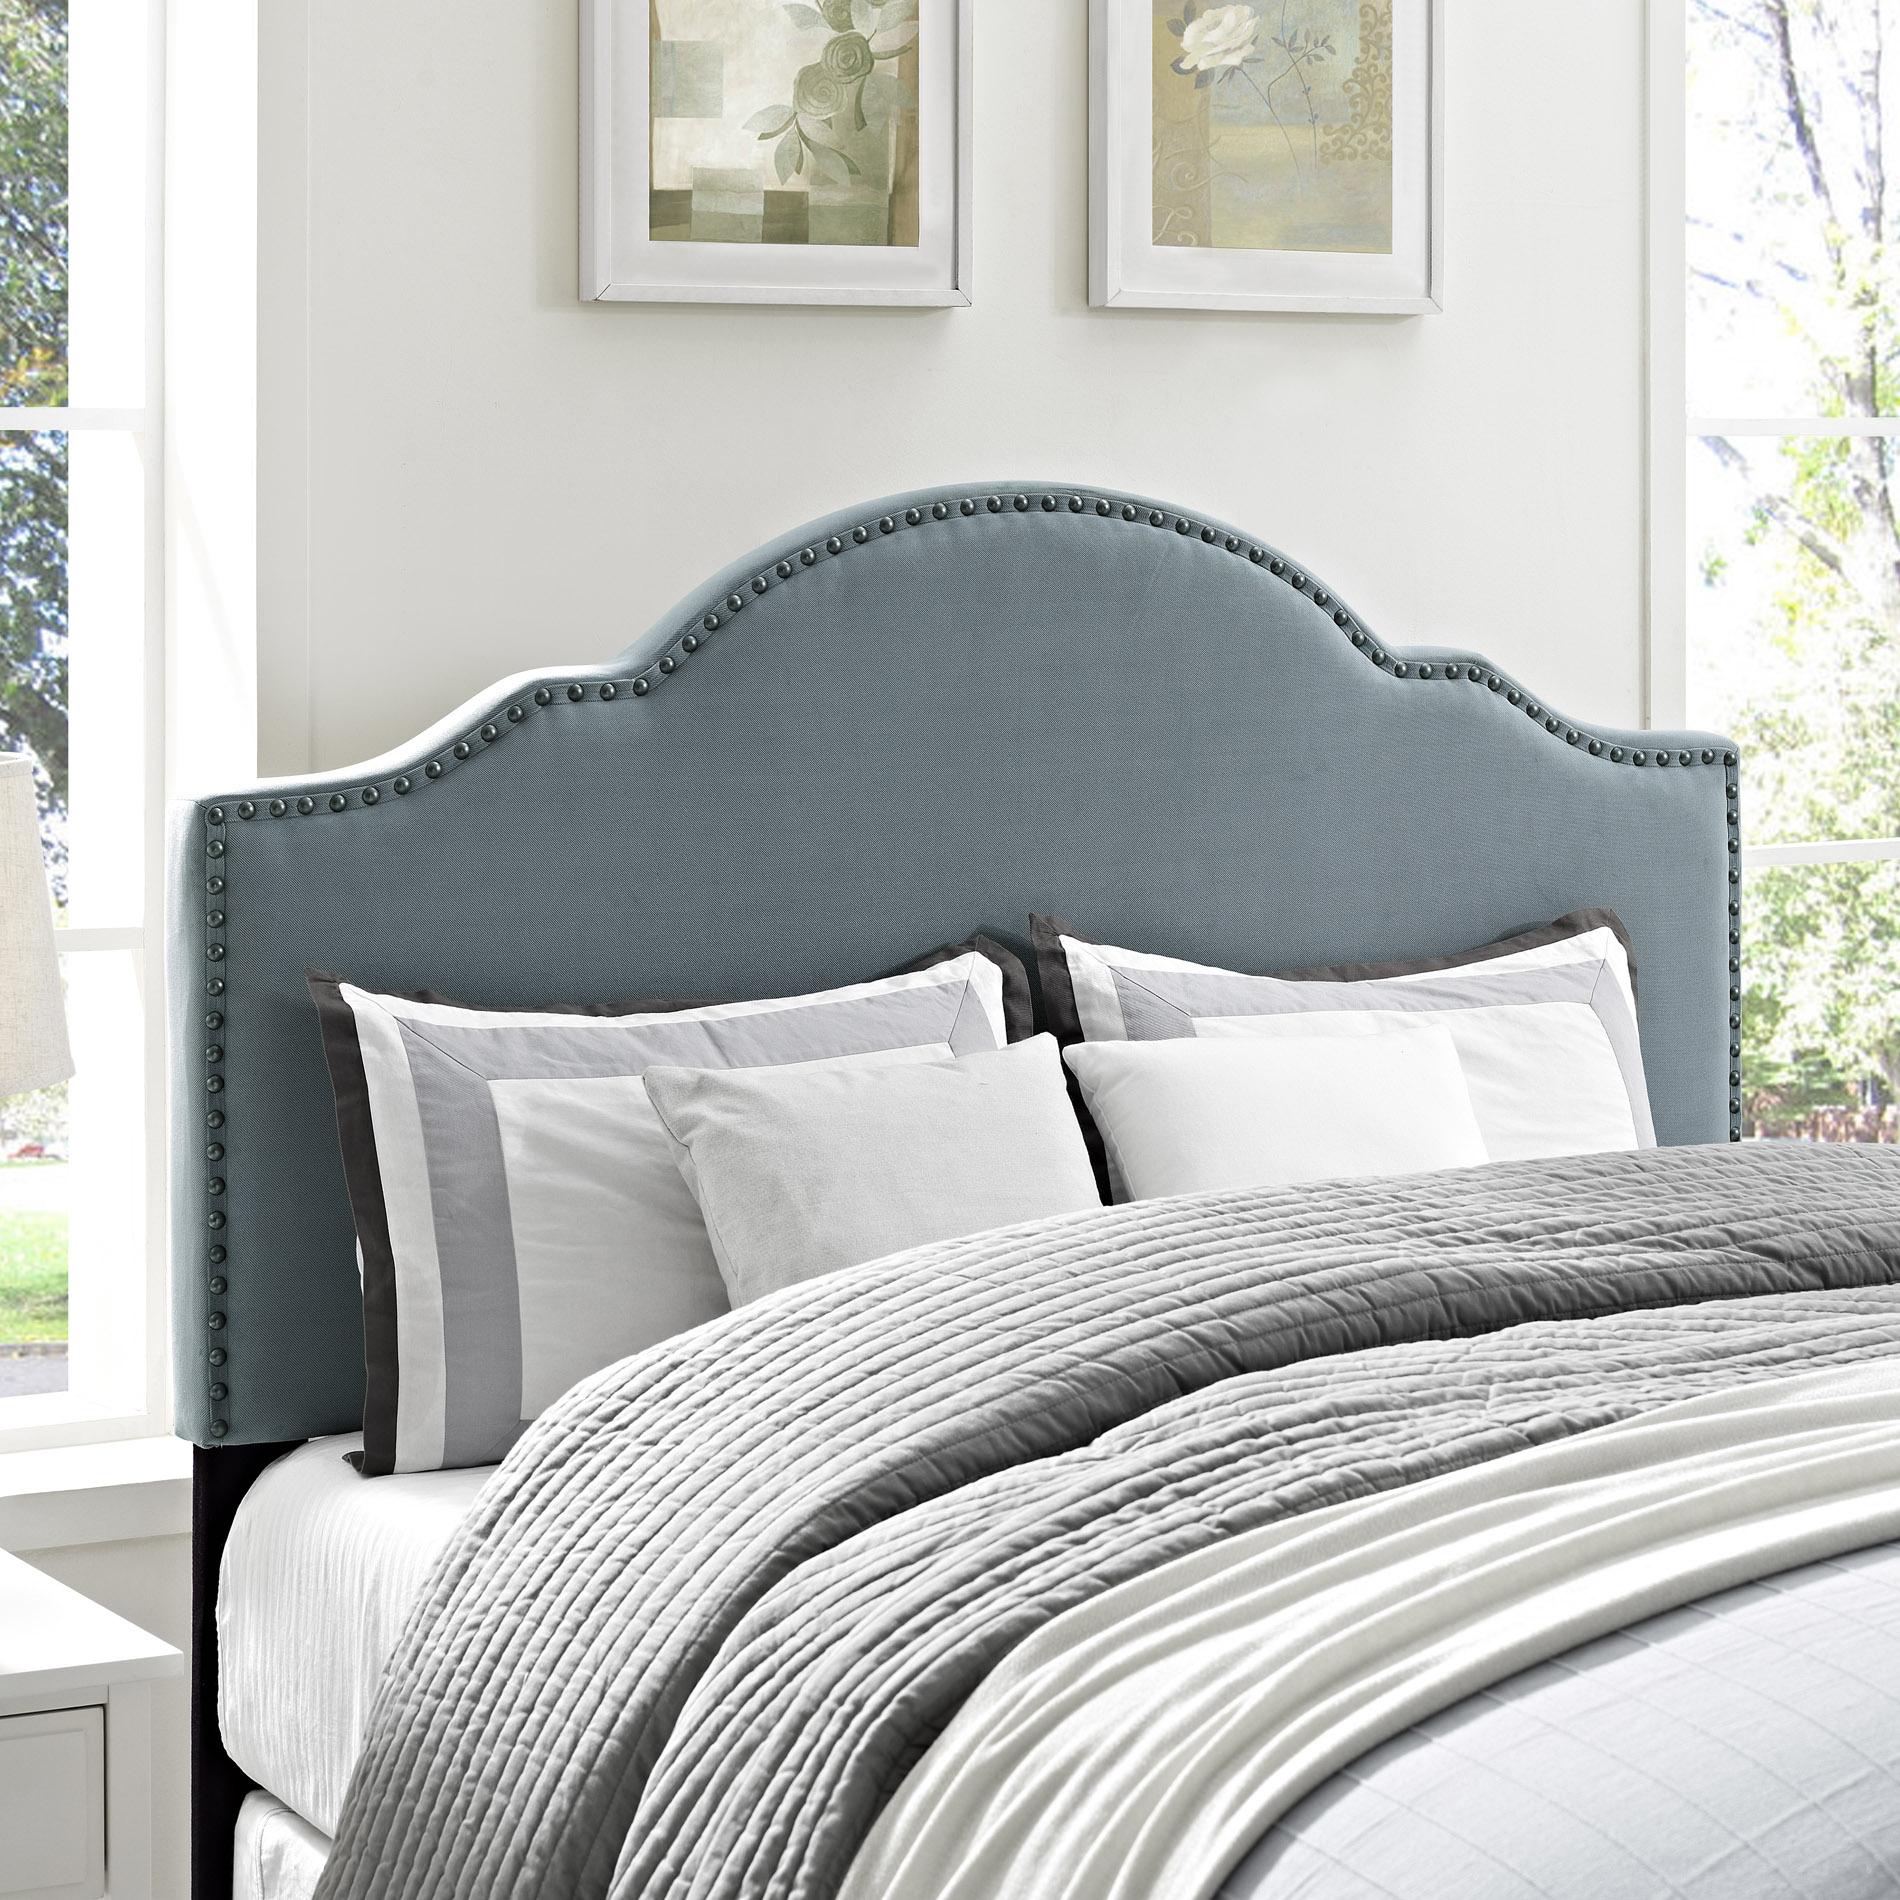 Dorel Sloane Upholstered Headboard Multiple Colors And Sizes